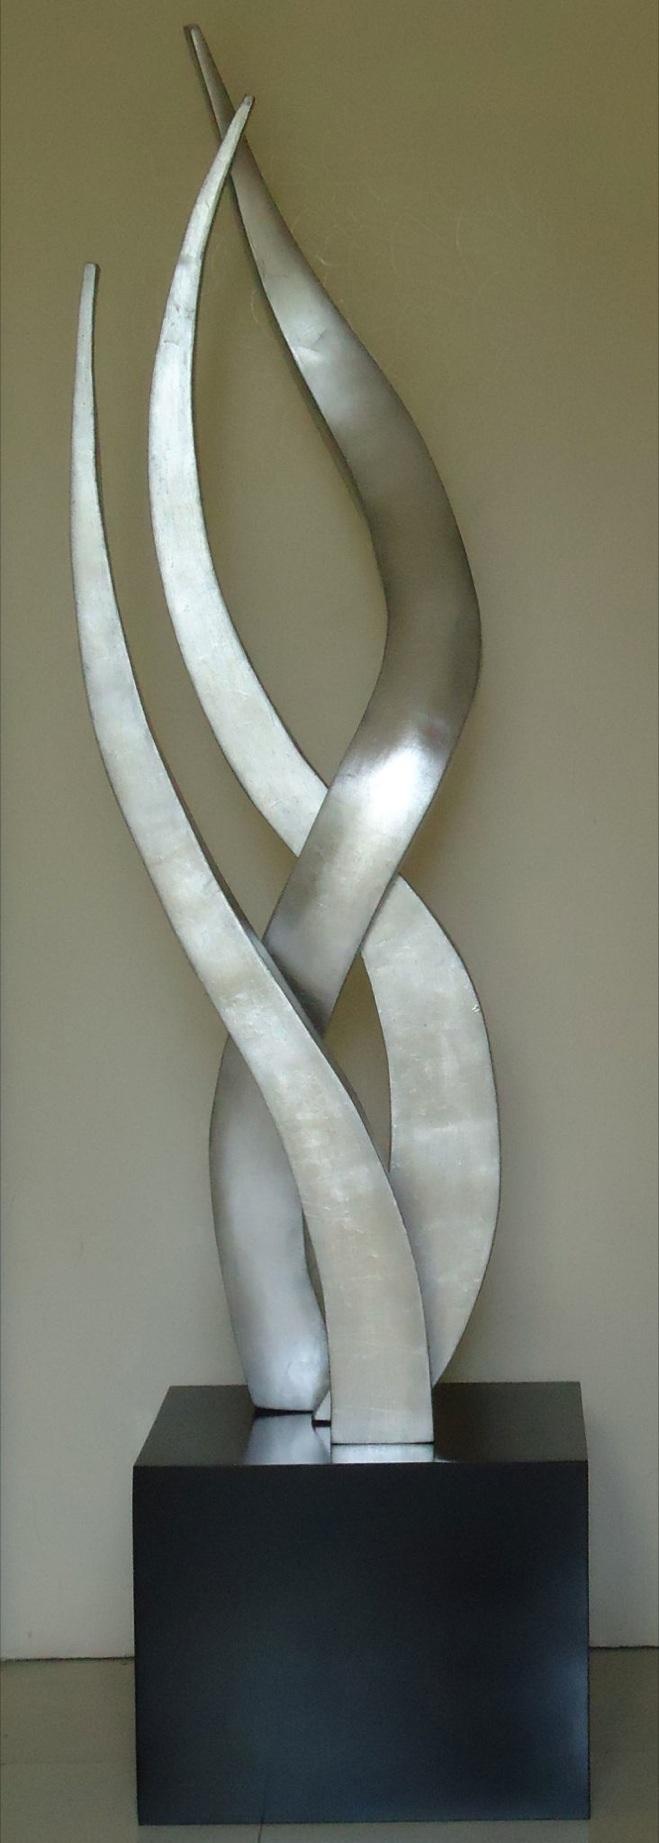 ESC Swivel Norma Lujan Sculpturist - Guadalajara